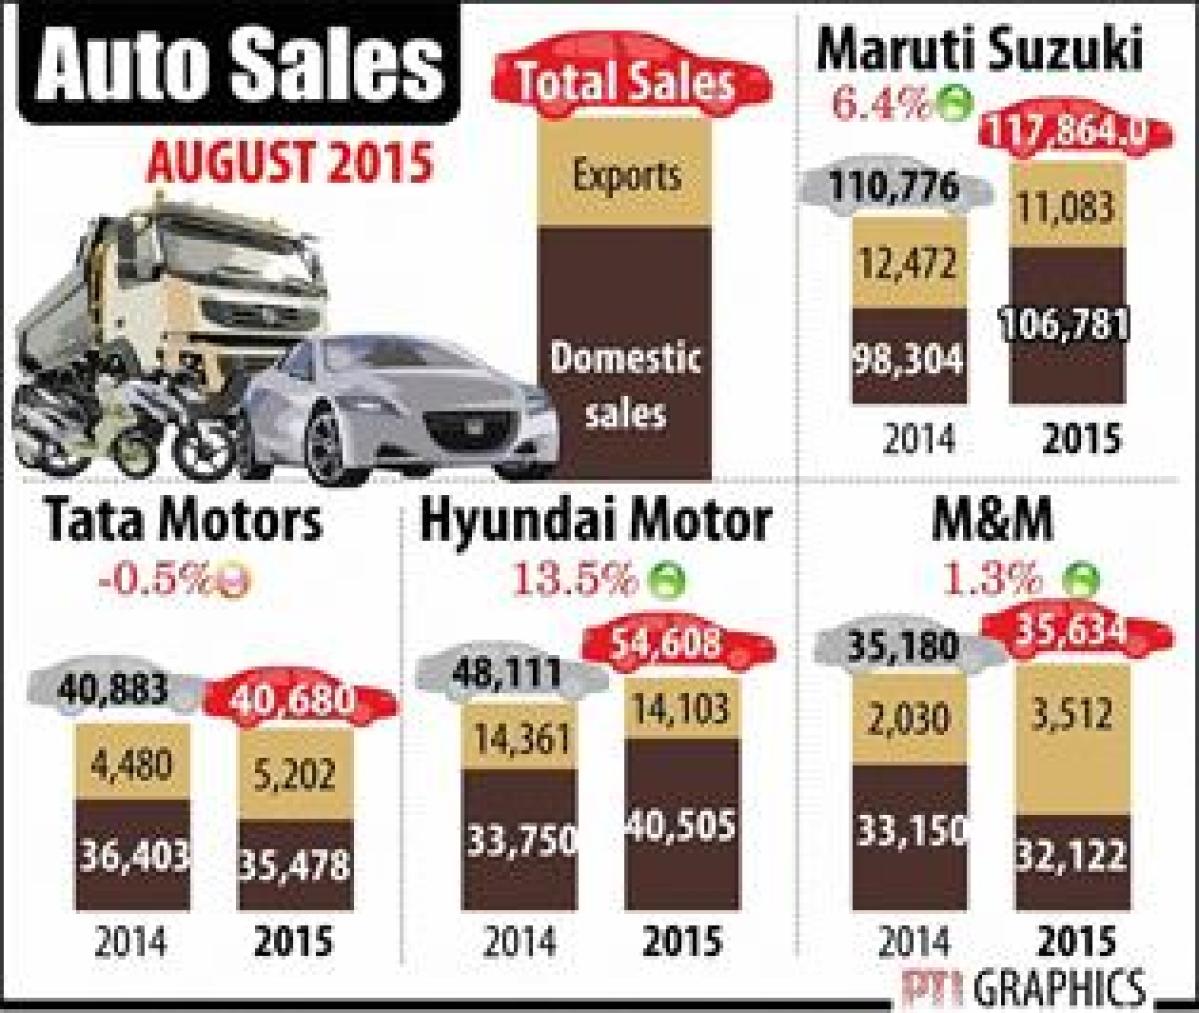 Maruti Suzuki, Hyundai lead domestic car sales in August